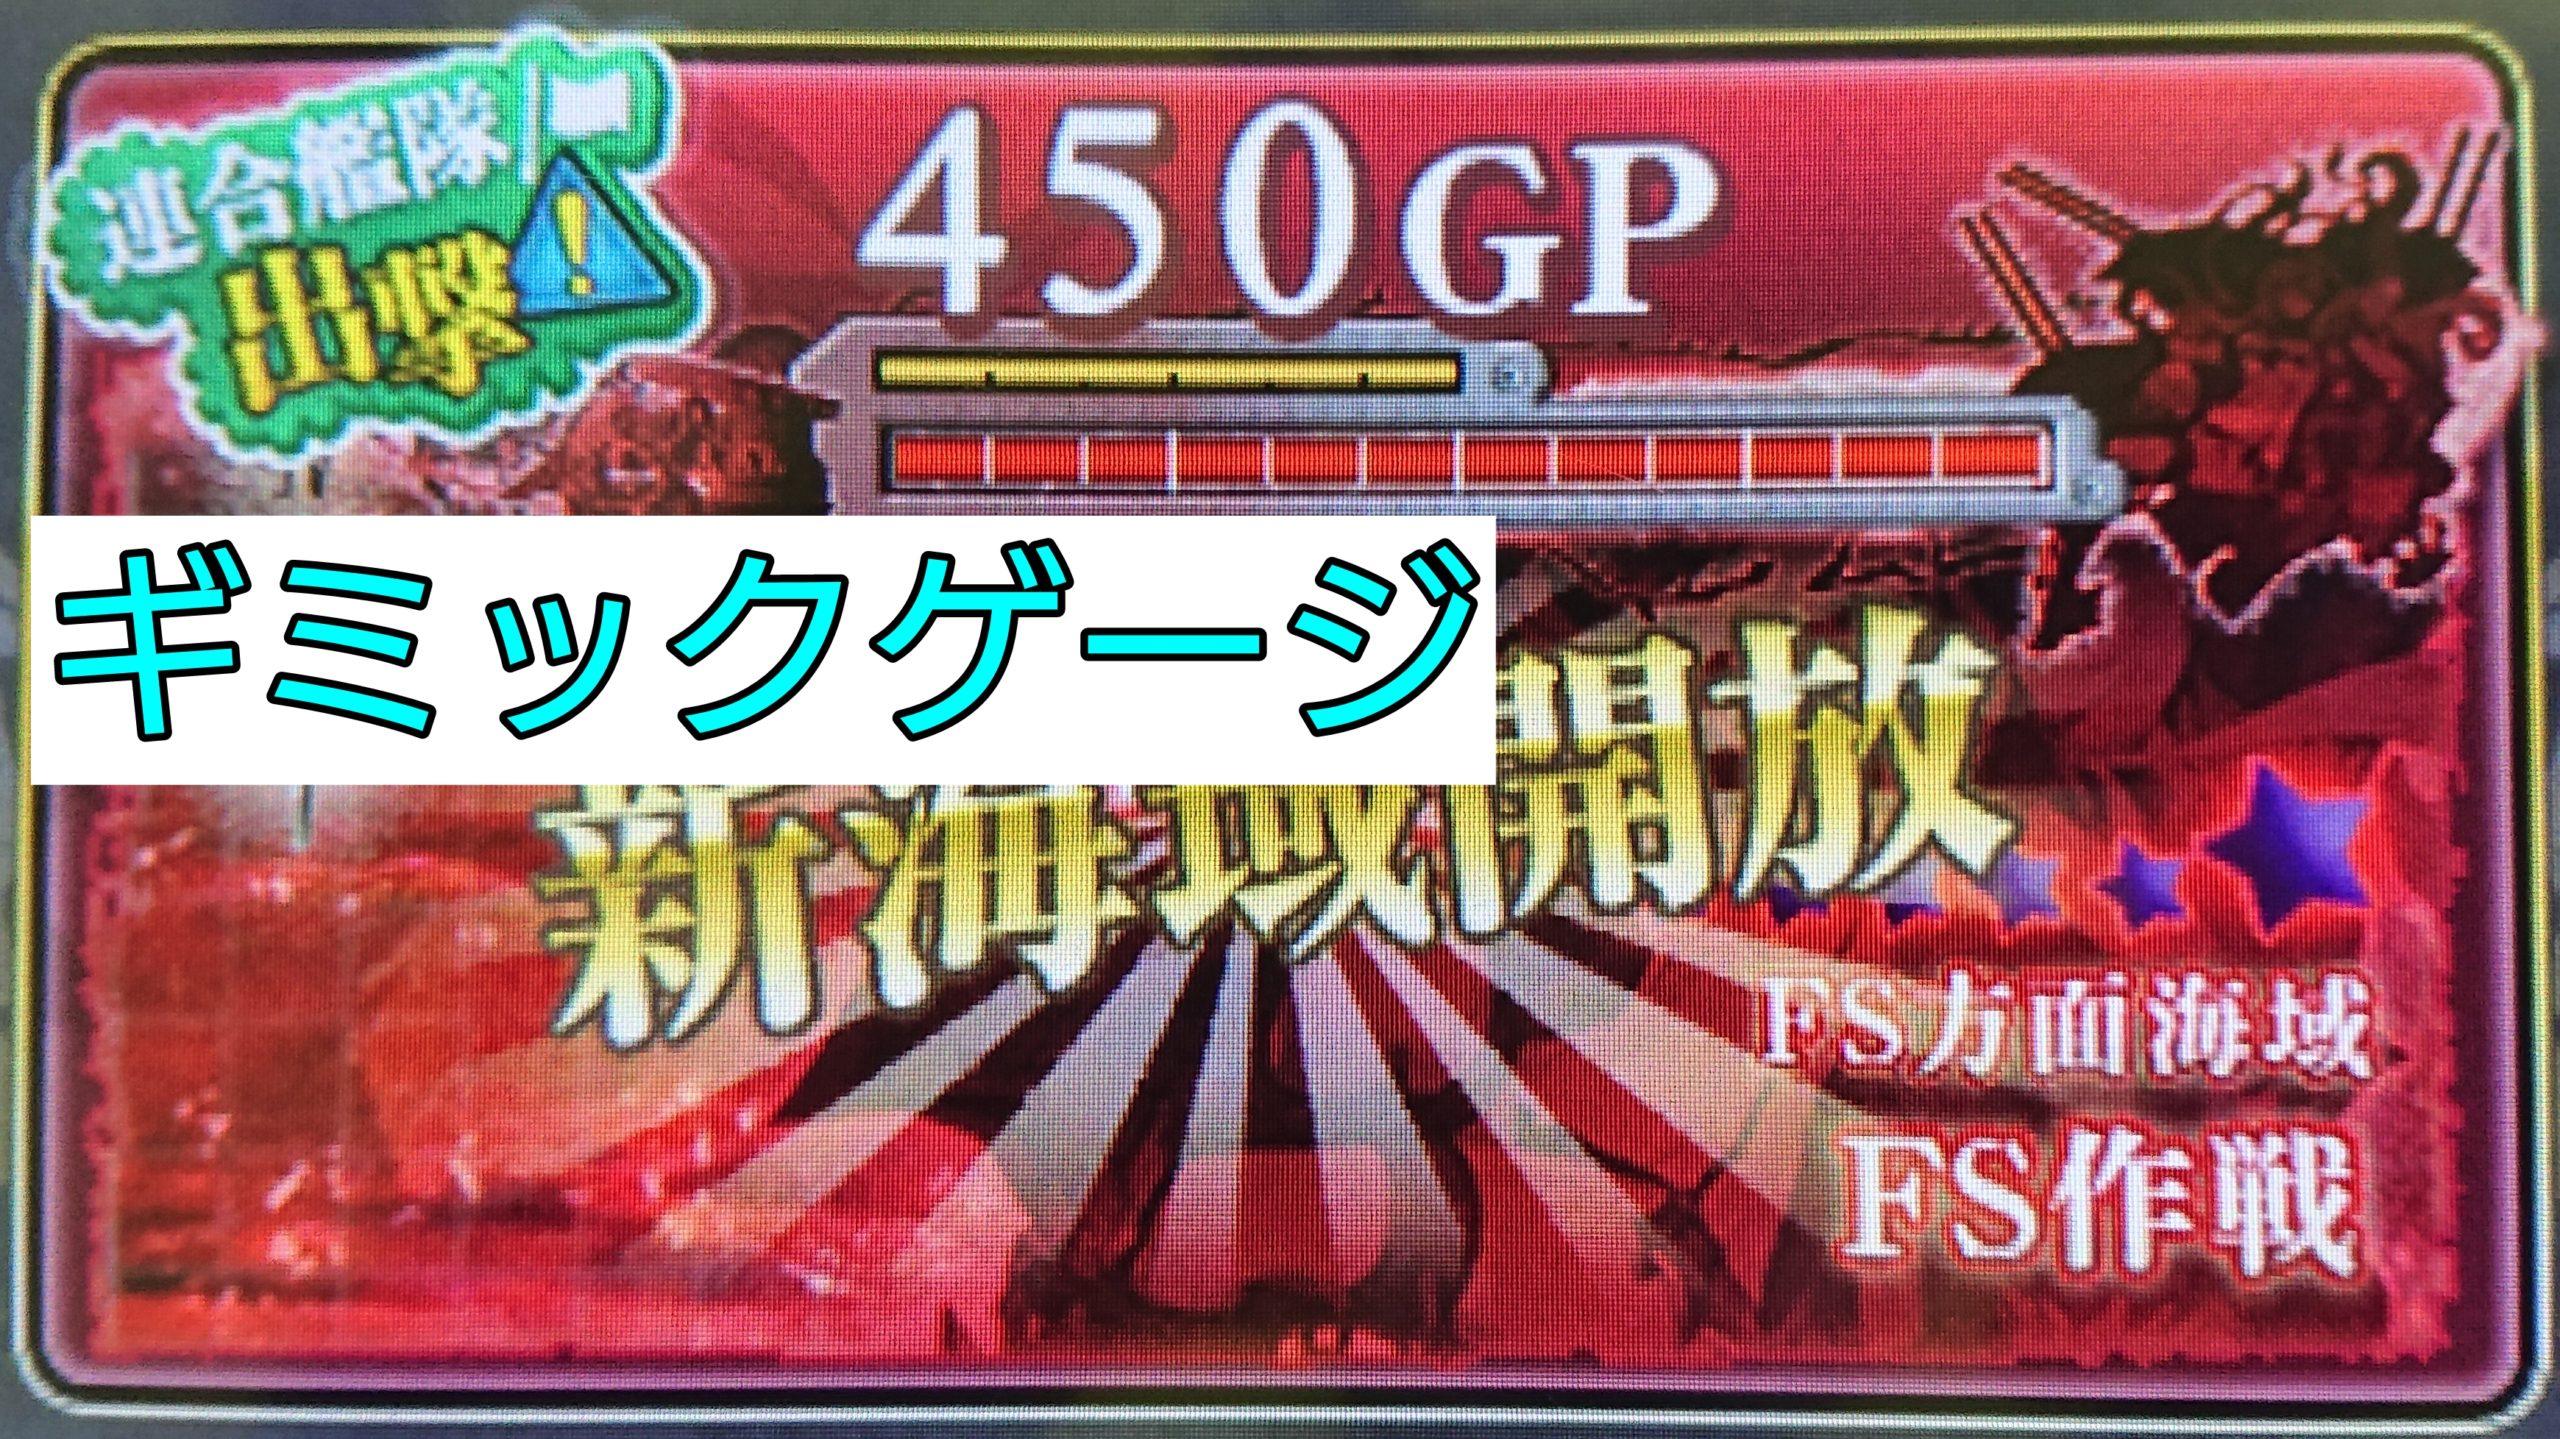 【AC】E6-1 FS作戦(甲作戦)ギミックゲージ攻略